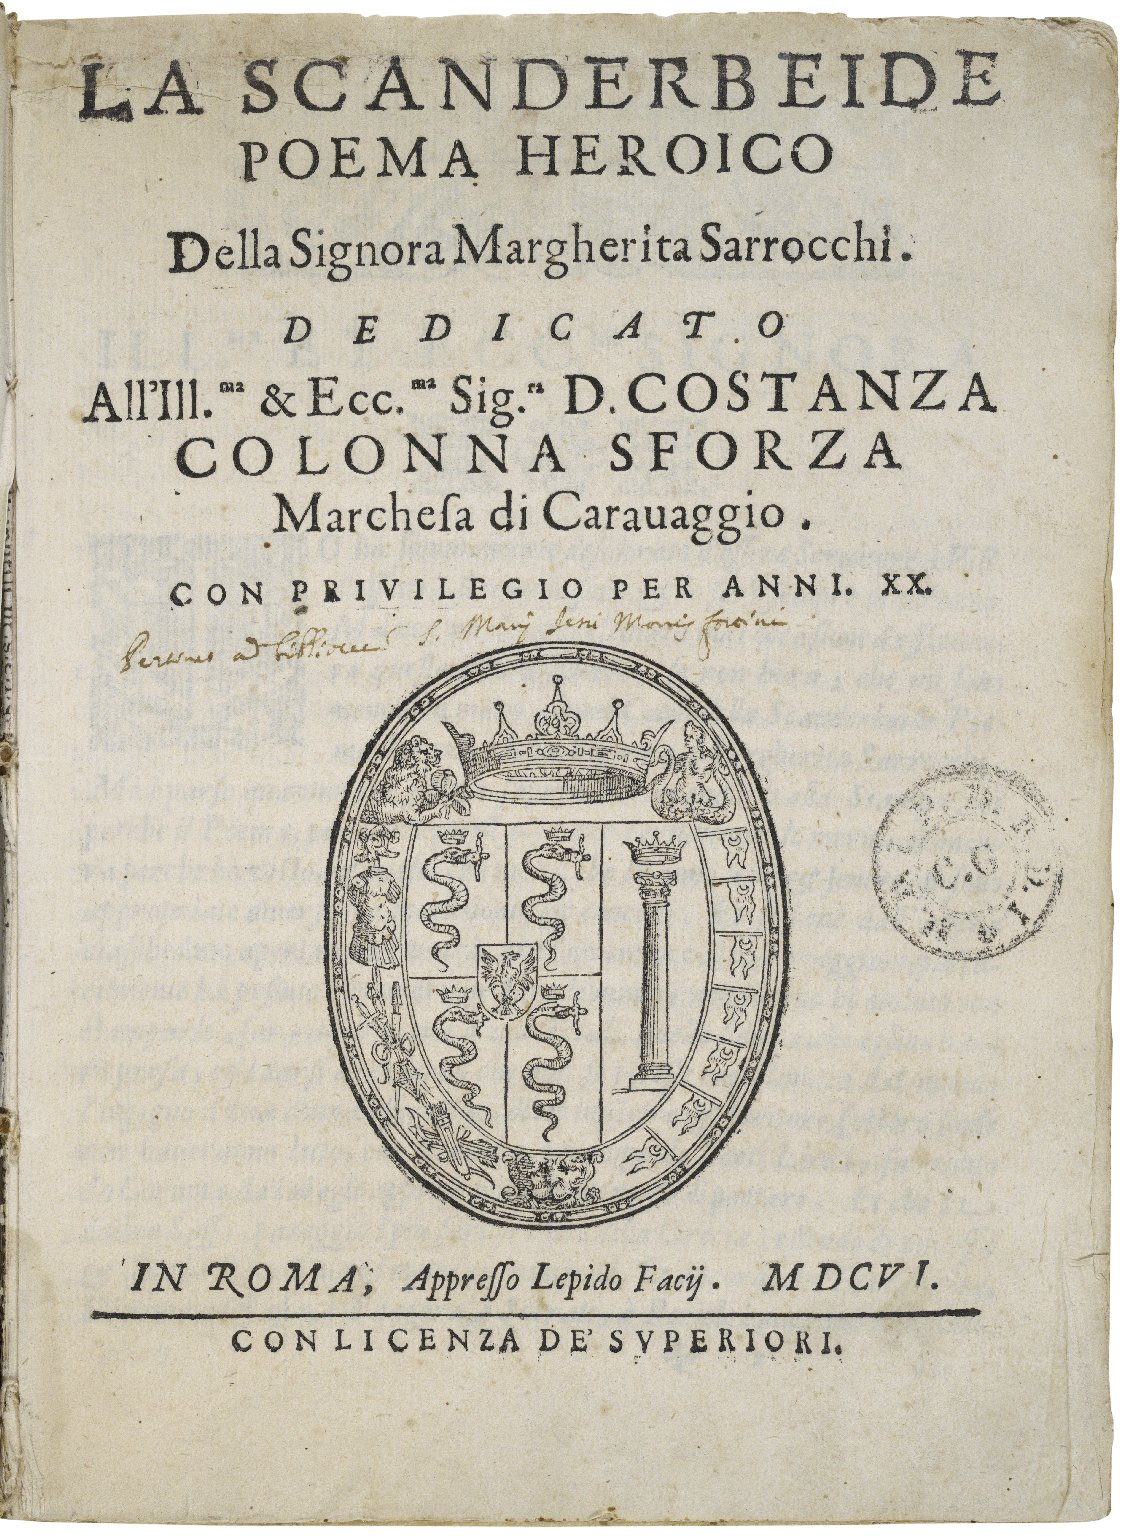 La Scanderbeide : poema heroico / della signora Margherita Sarrocchi.